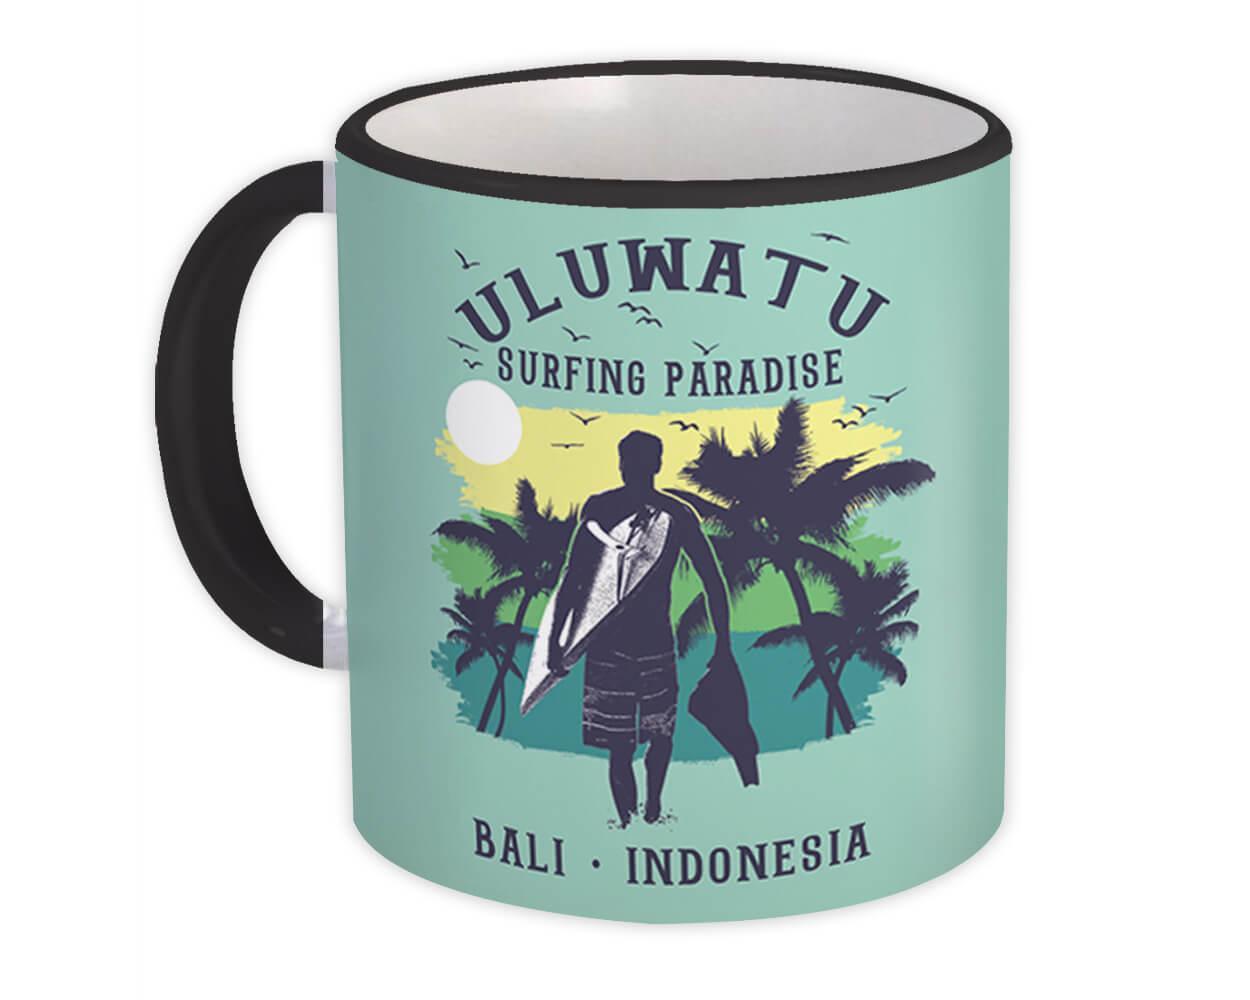 Uluwatu Bali : Gift Mug Indonesia Souvenir Surfing Surfer Beach